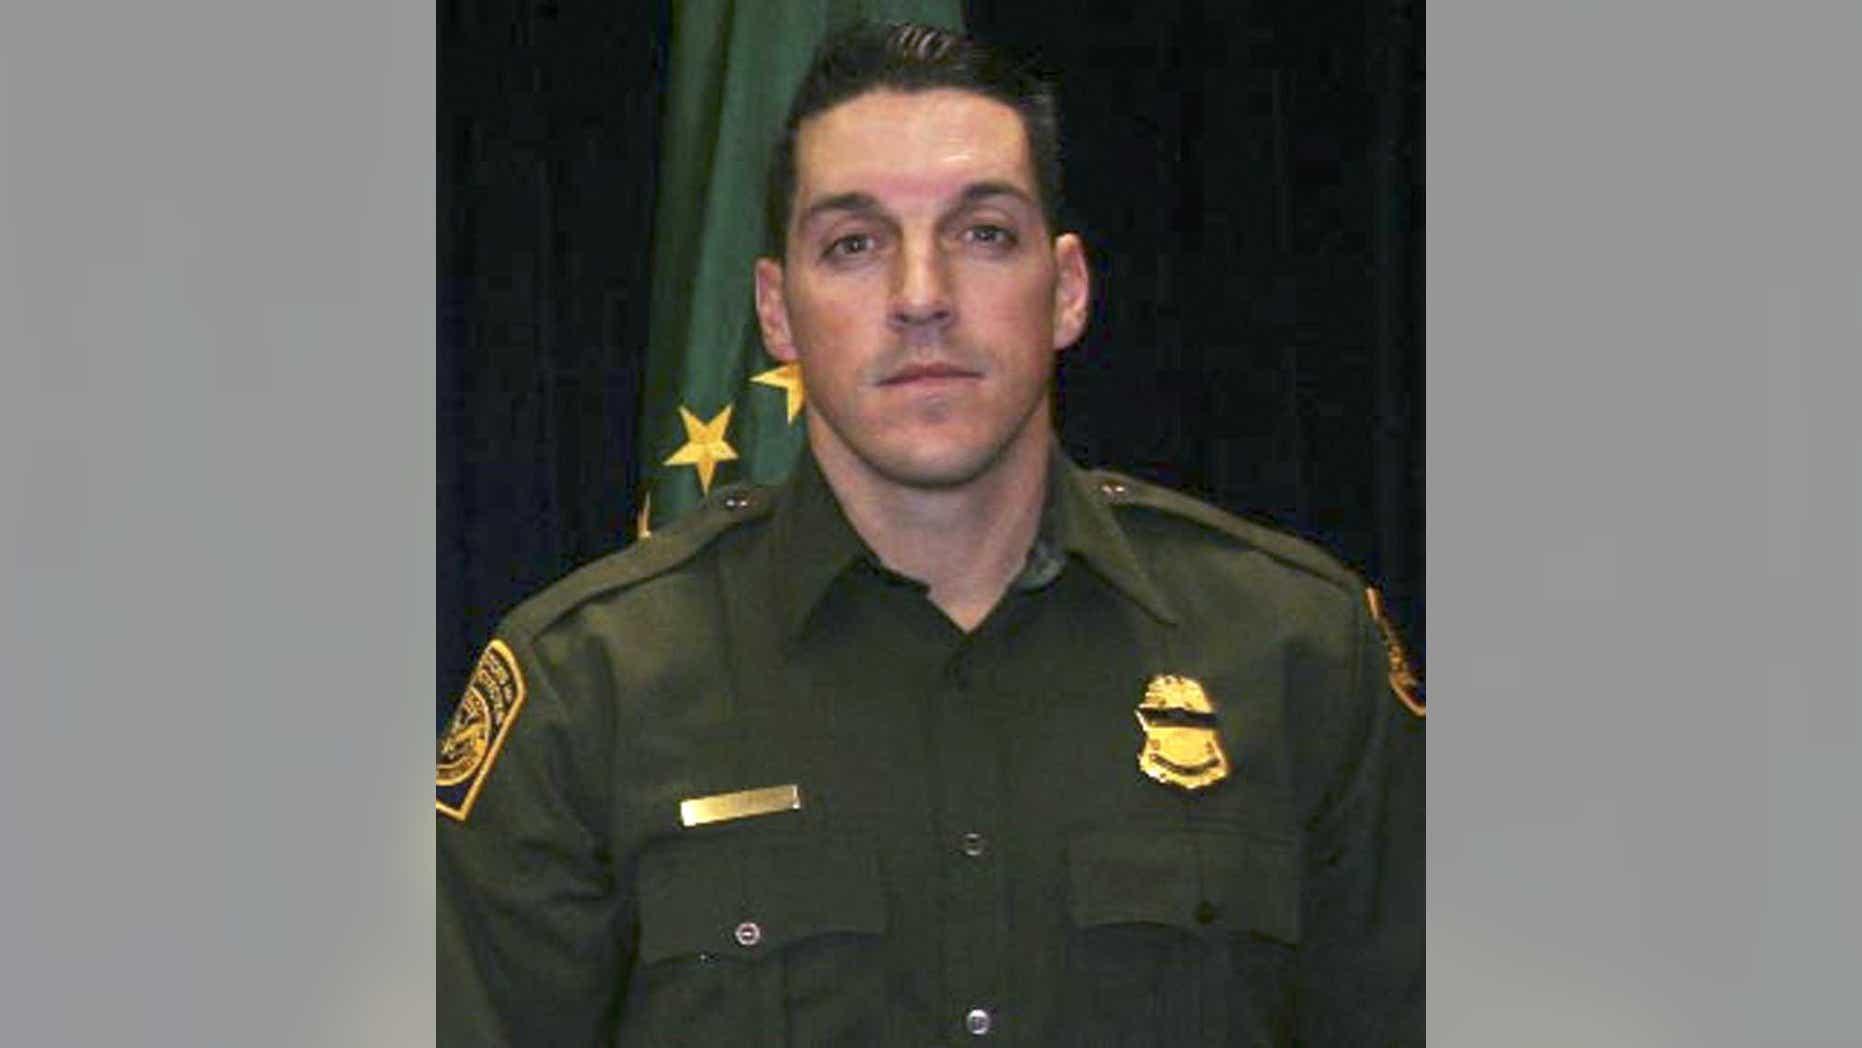 U.S. Border Patrol agent Brian A. Terry